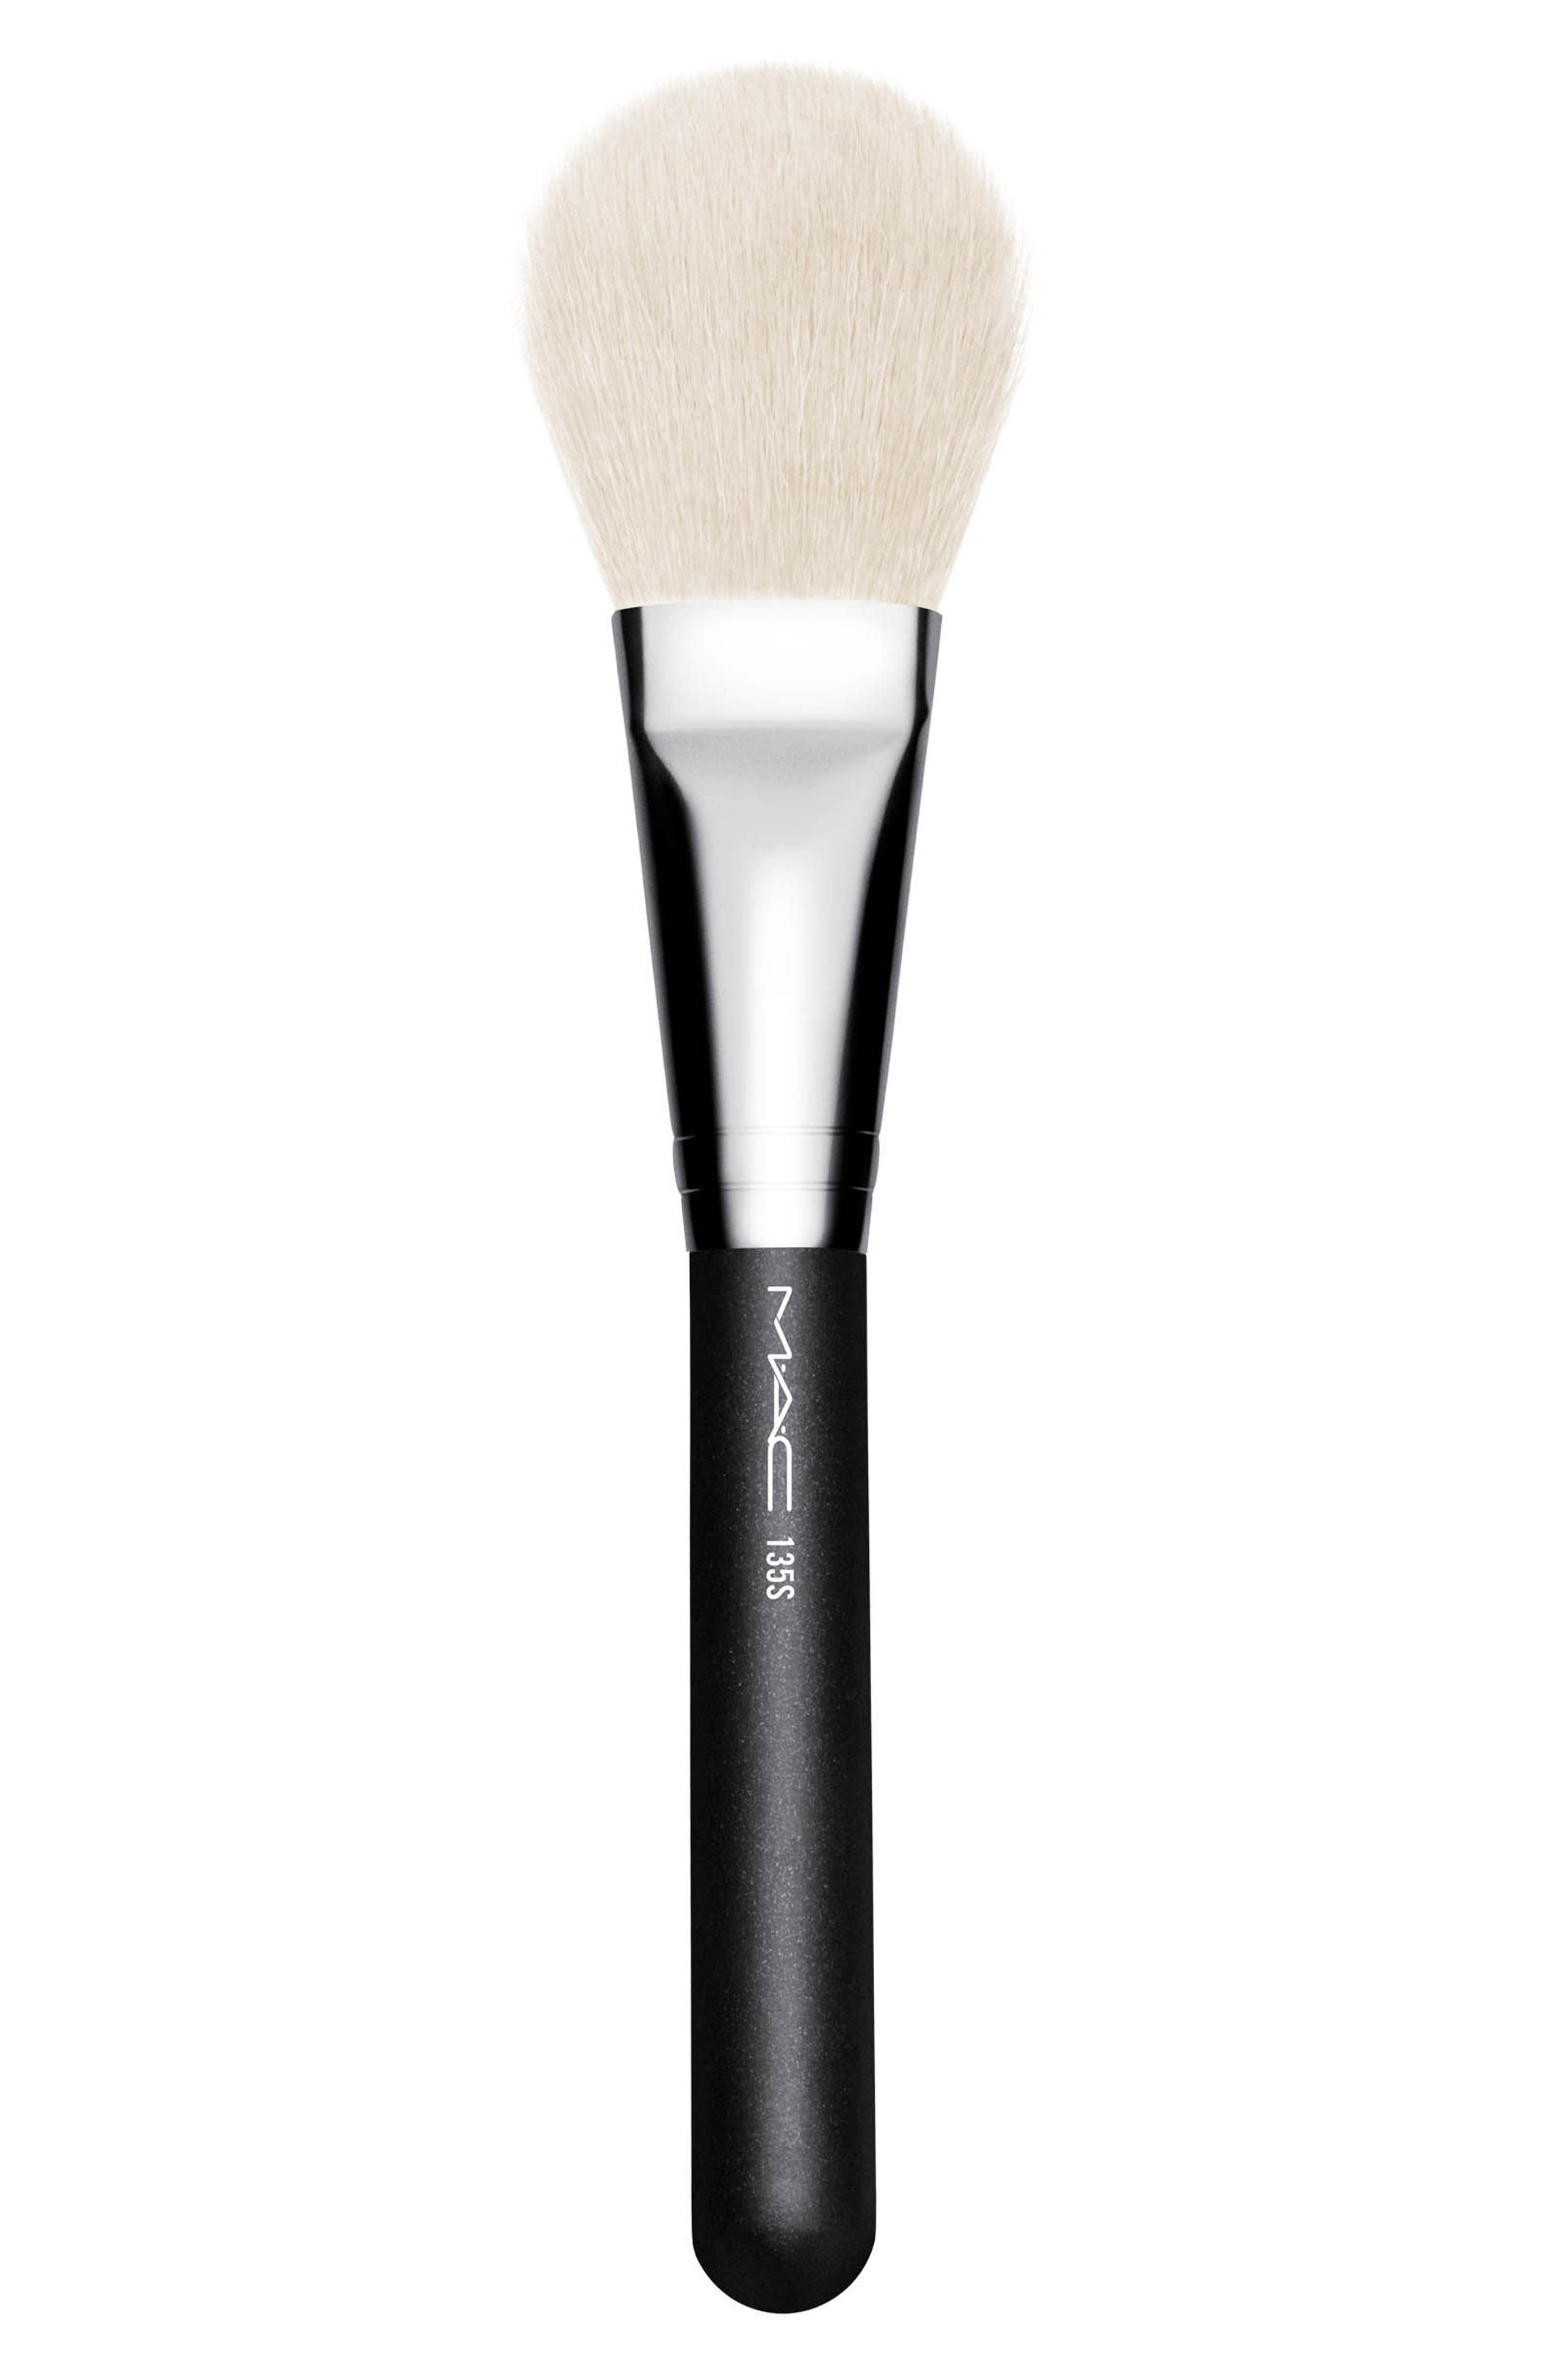 MAC 135S Synthetic Large Flat Powder Brush,                             Main thumbnail 1, color,                             000